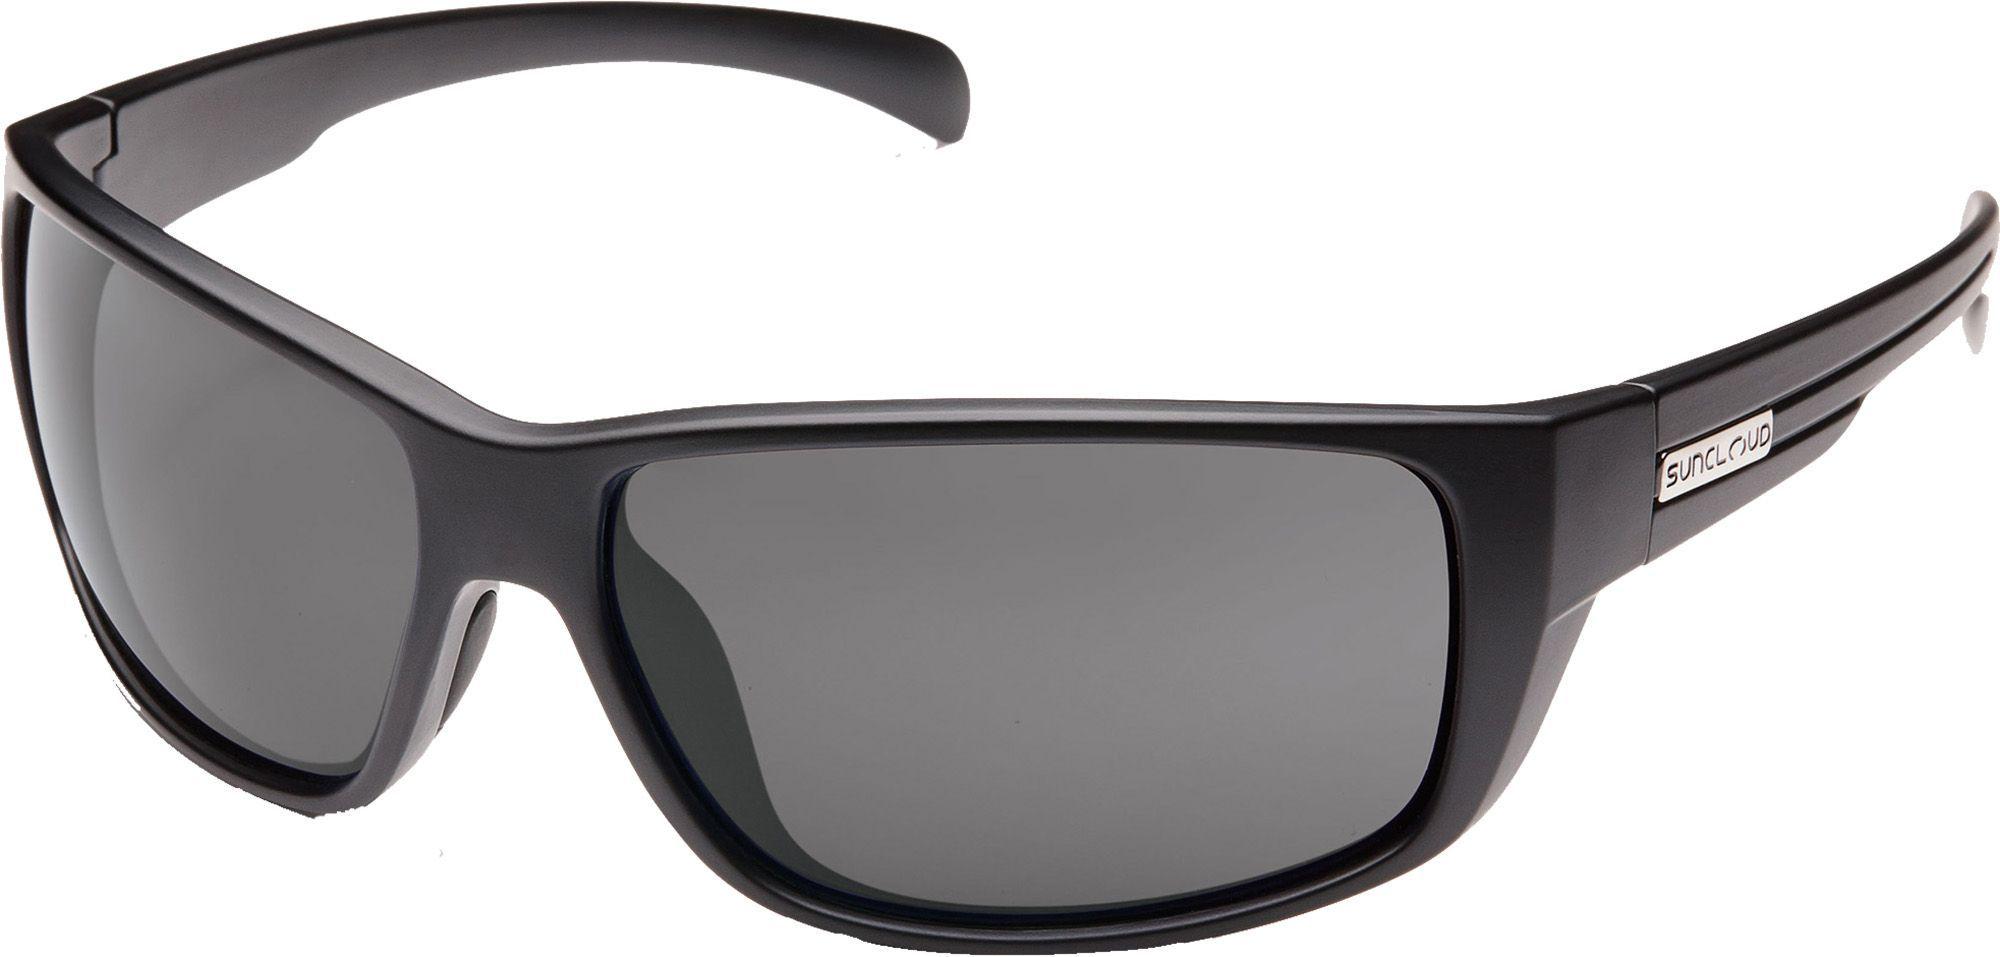 79c36299fd6 Smith Optic s Men s Milestone Polarized Sunglasses